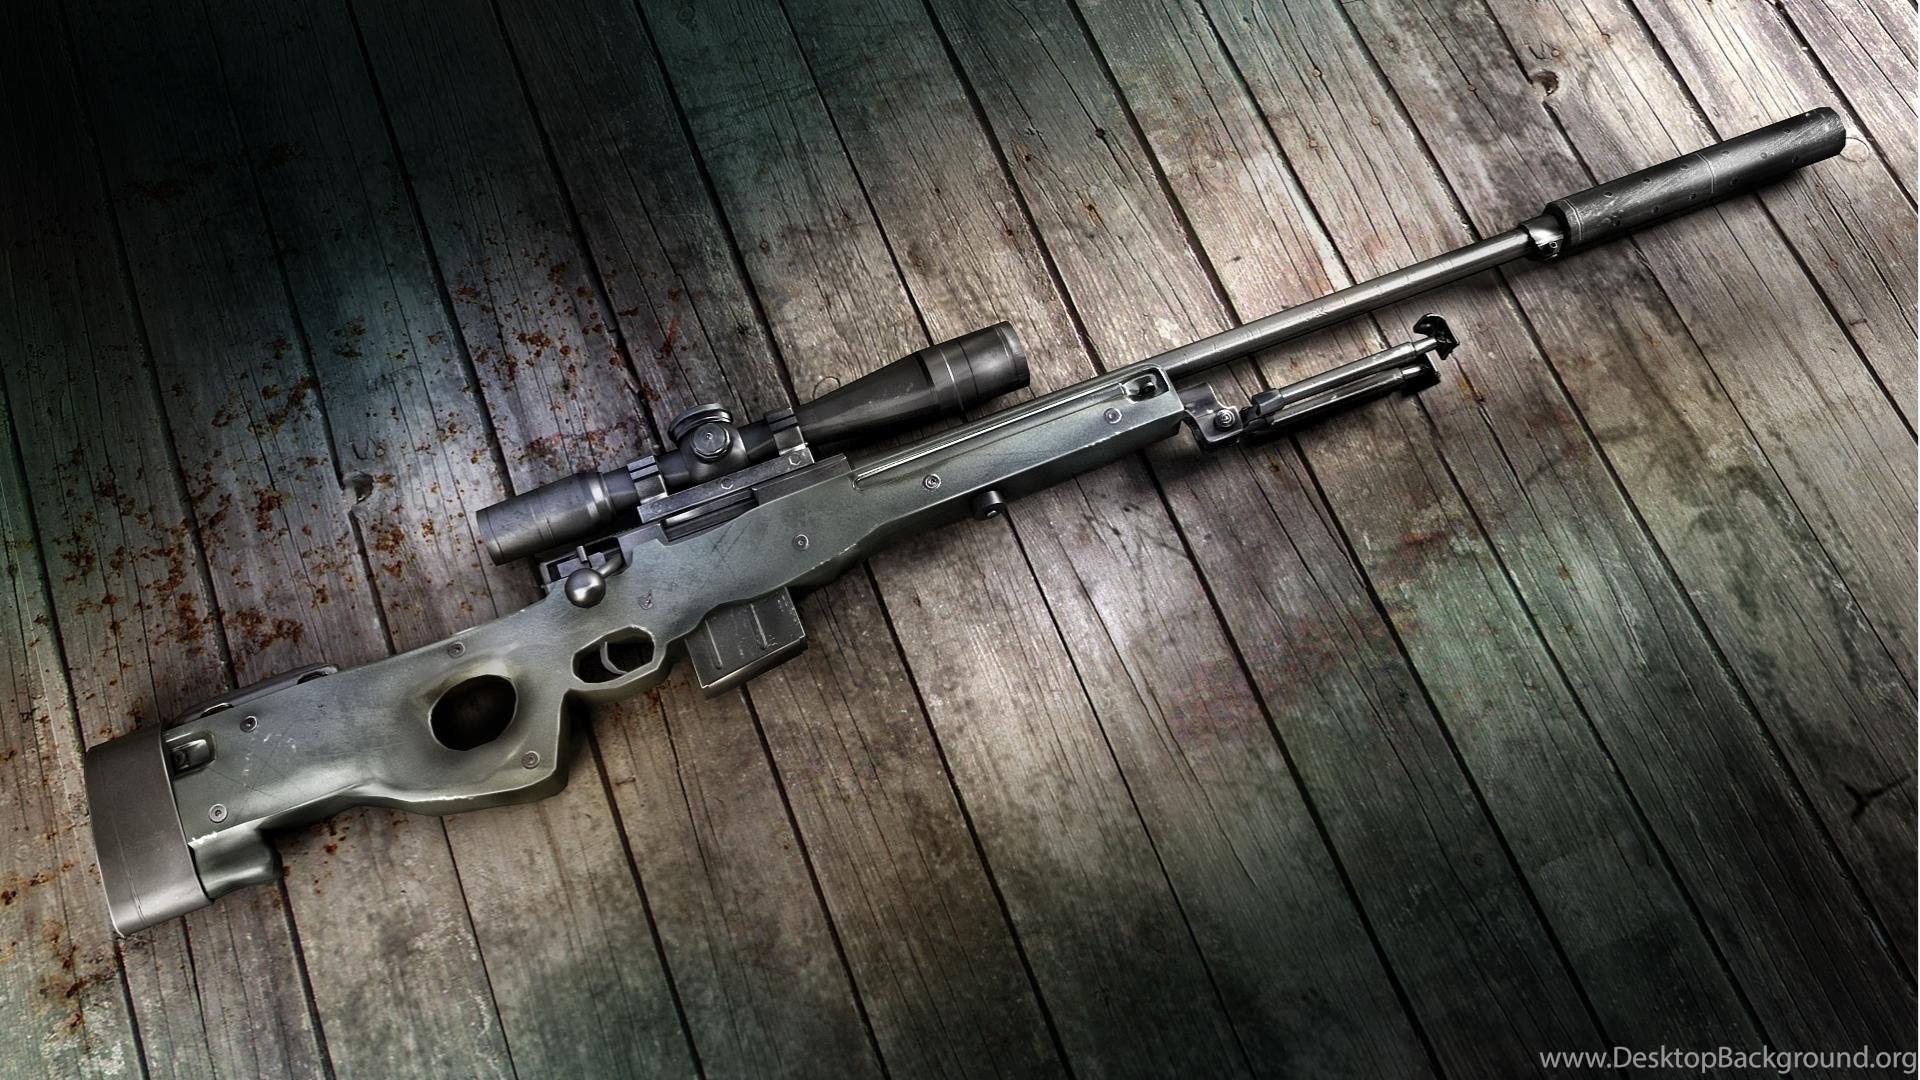 pubg gun wallpaper hd download